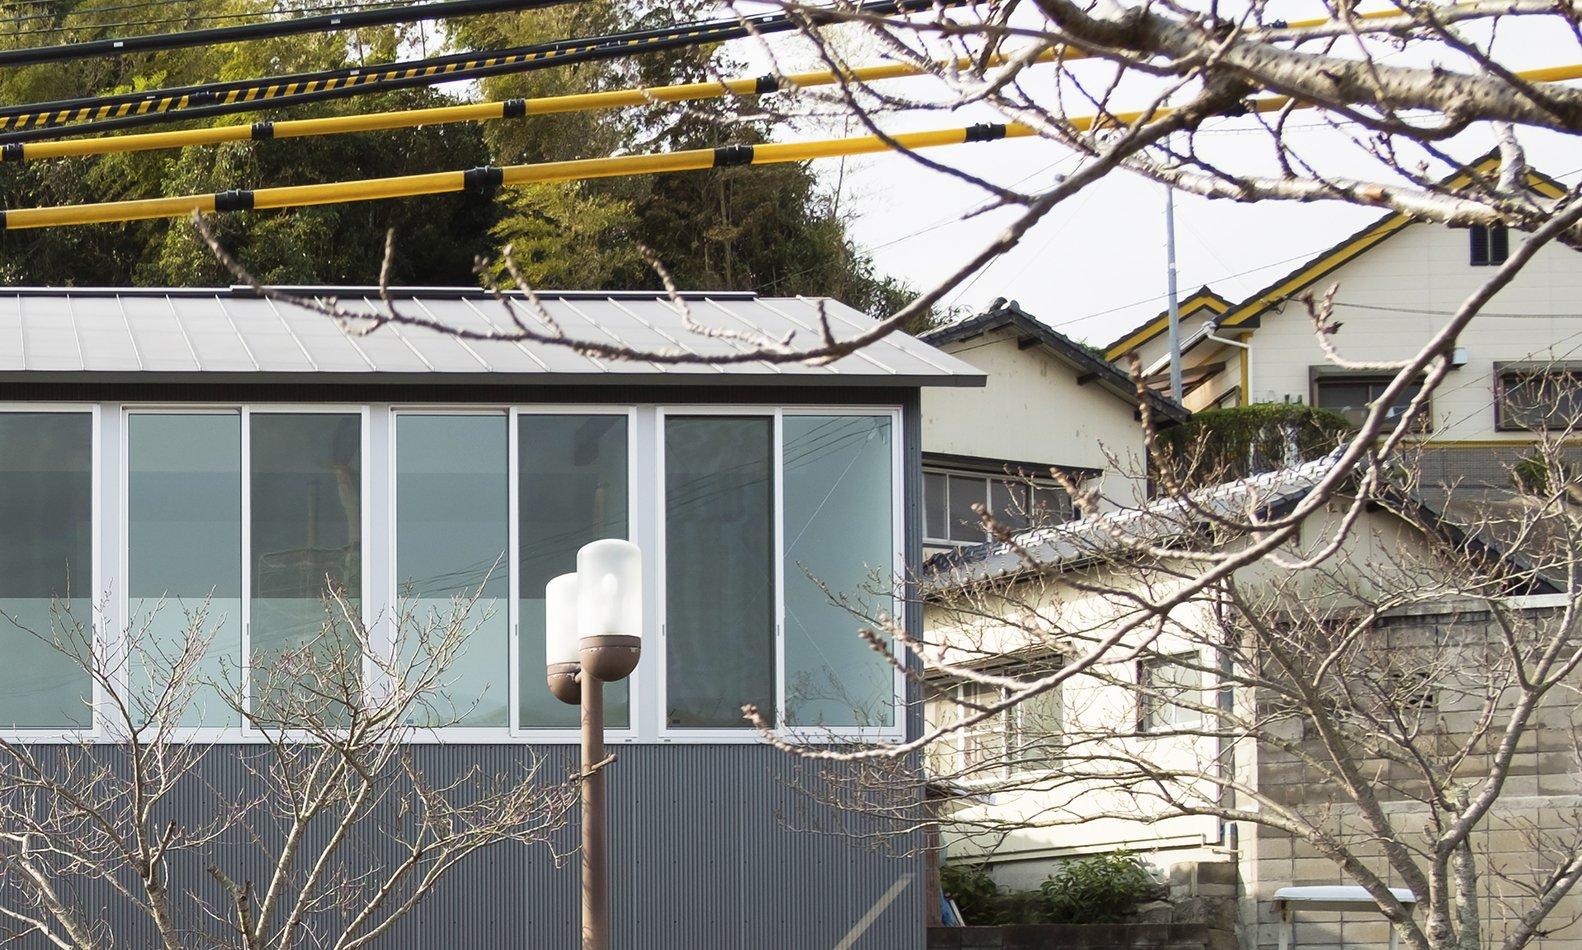 Photo 7 of 7 in House in Futako by Yabashi Architects & Associates